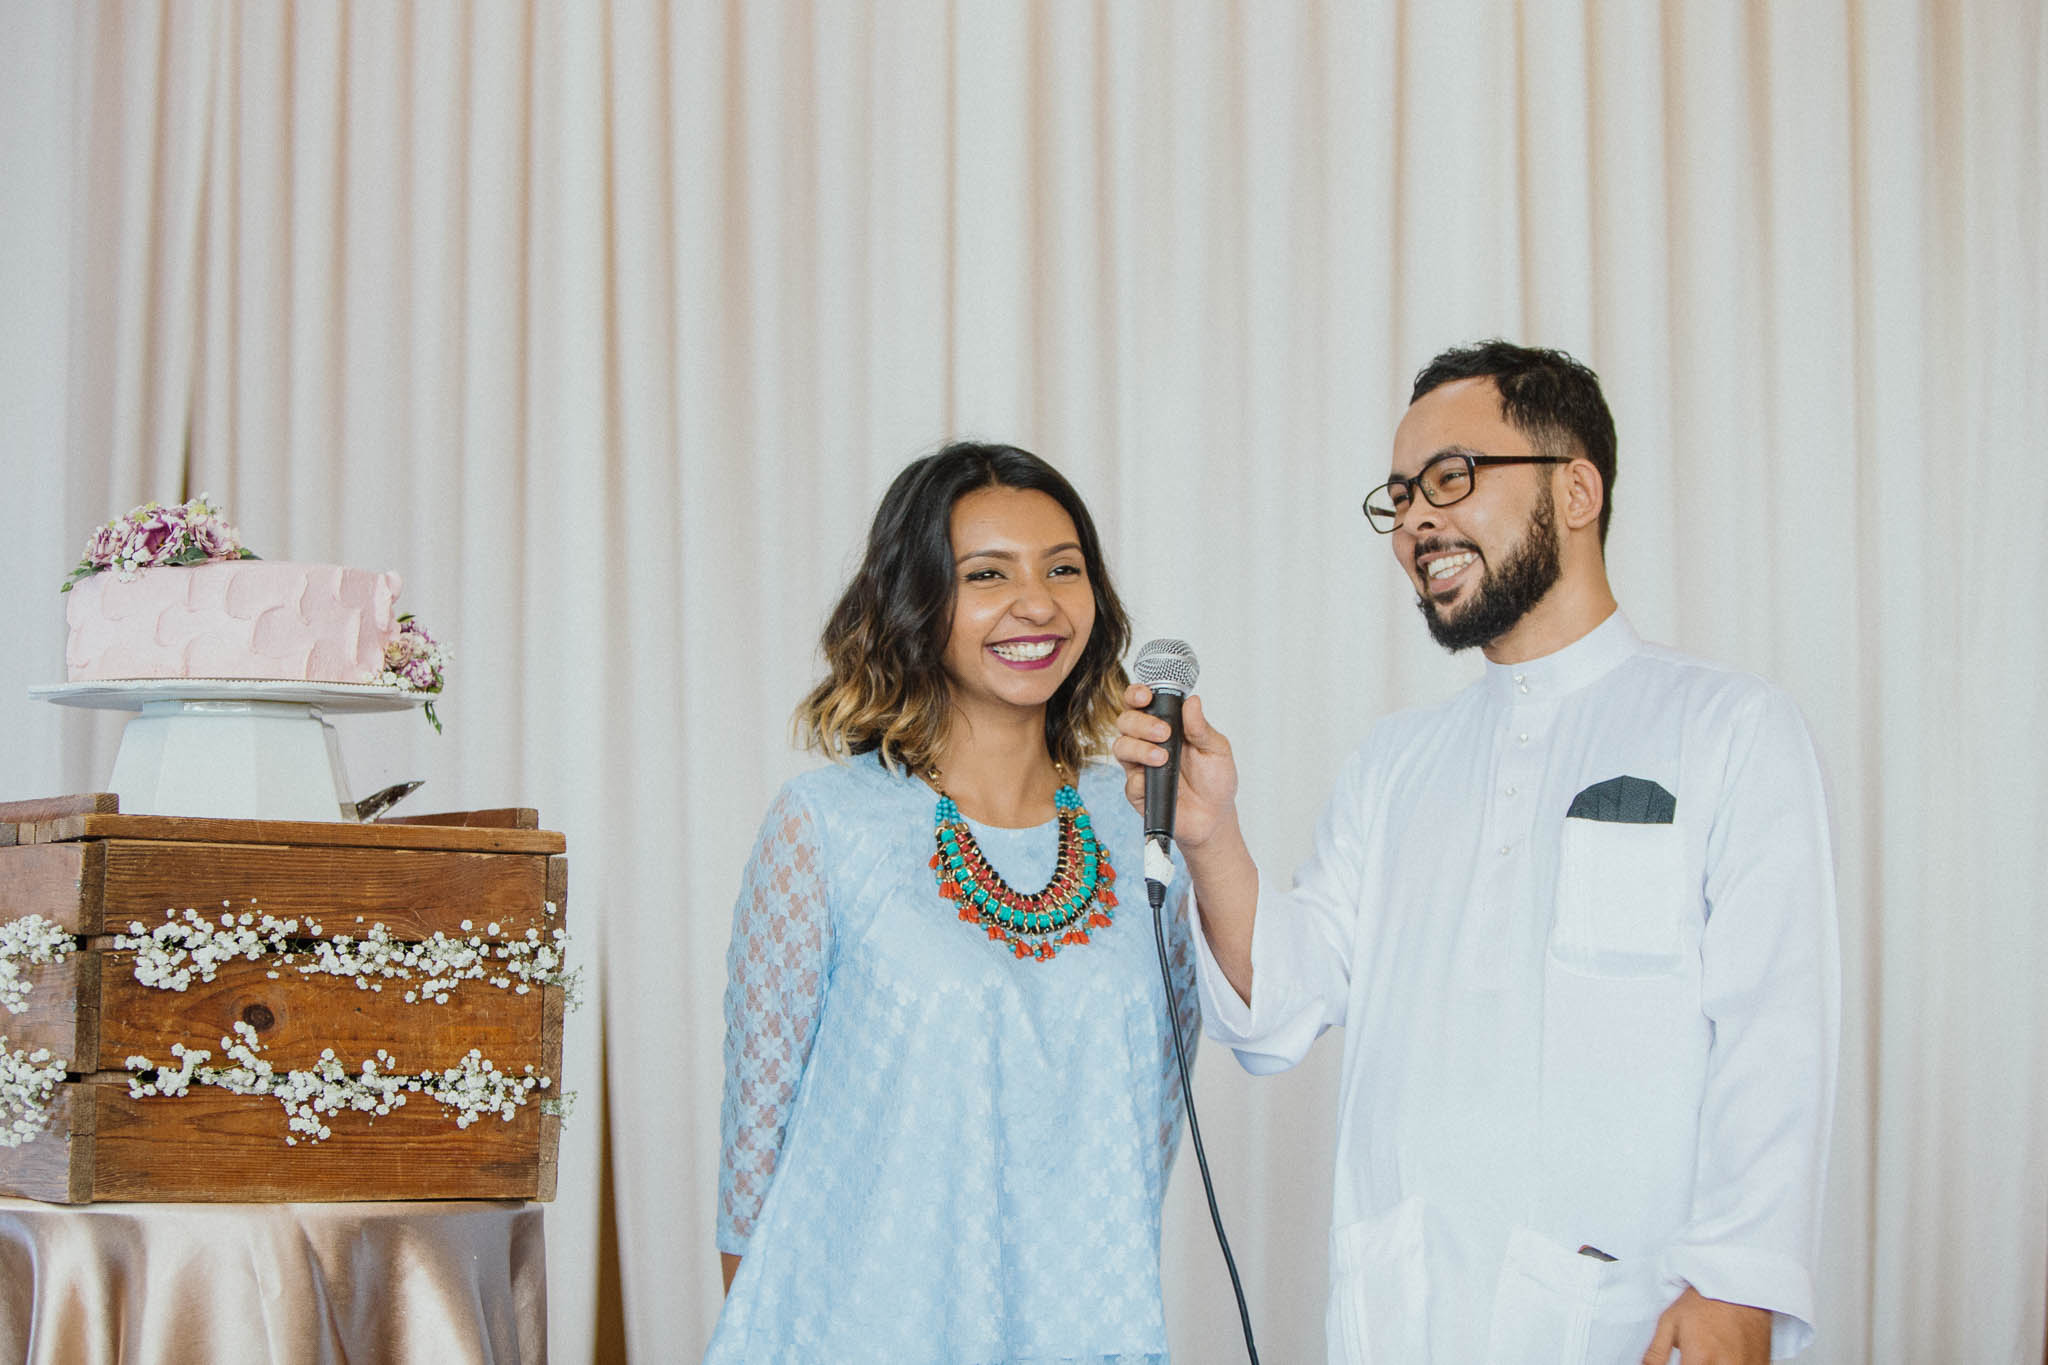 singapore-wedding-photographer-addafiq-nufail-062.jpg